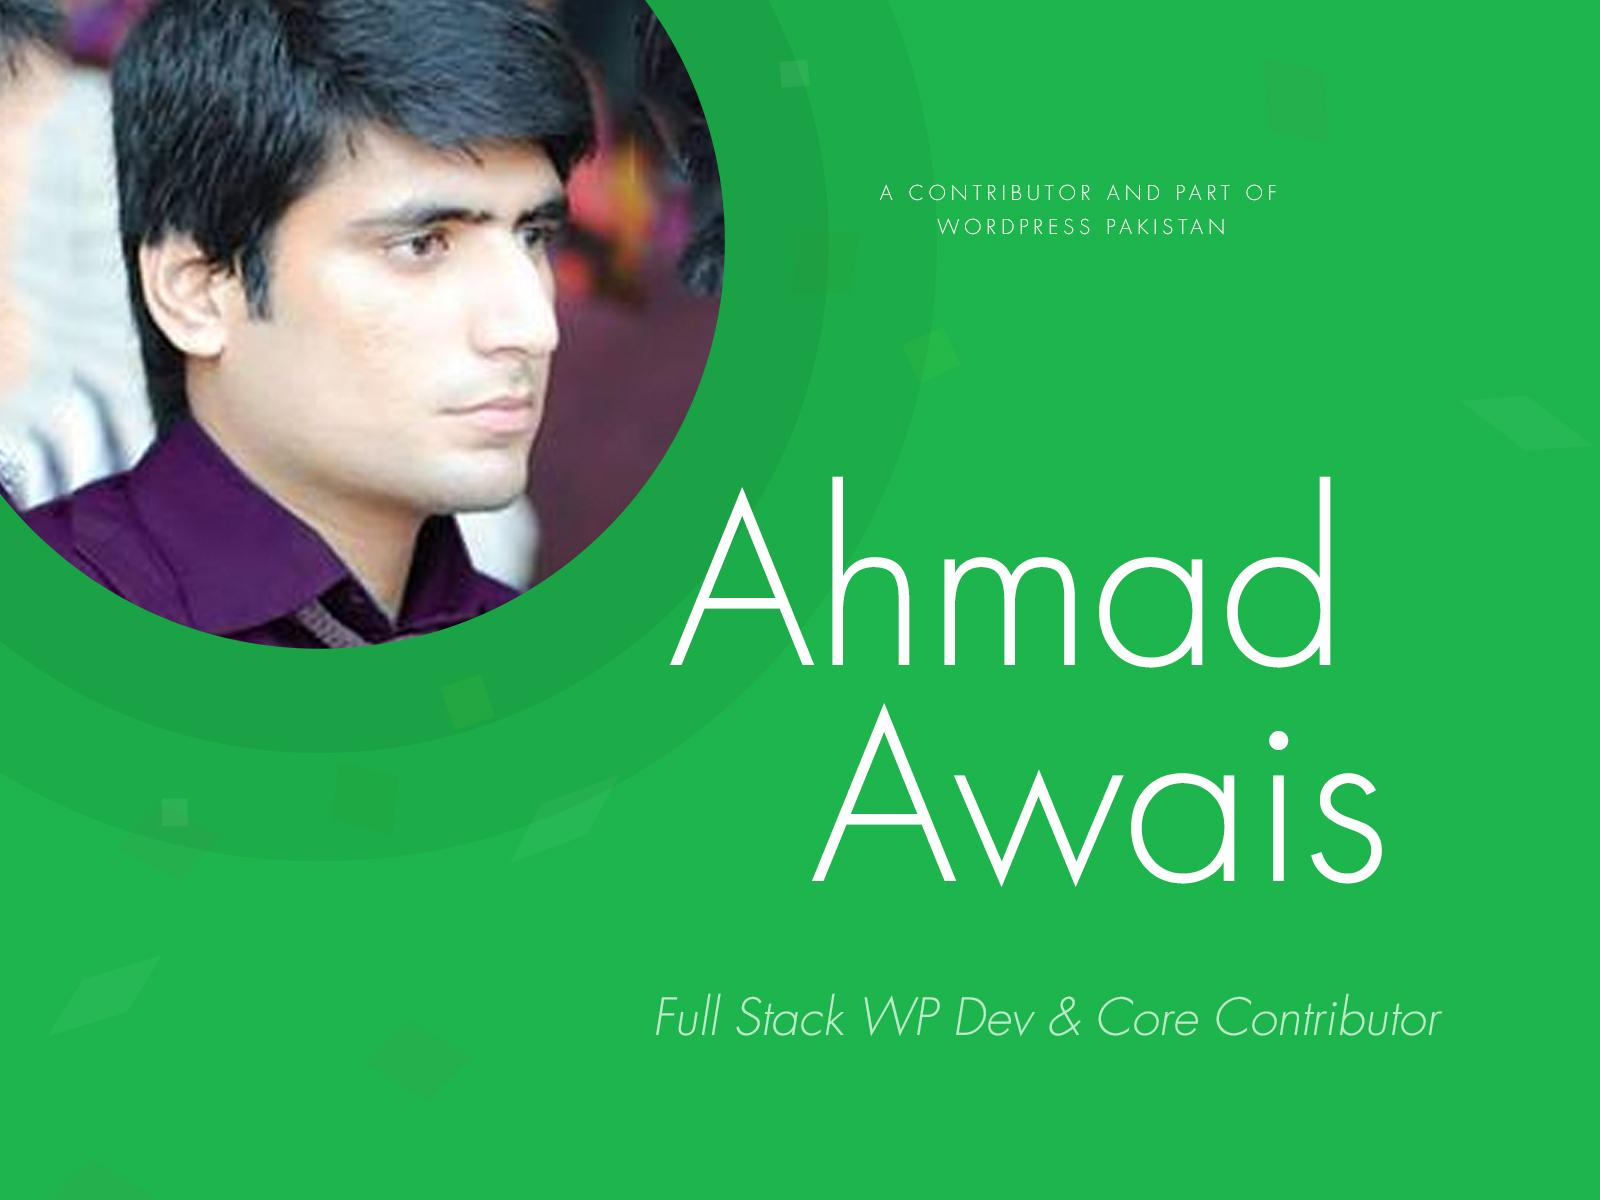 Ahmad Awais Launches Script